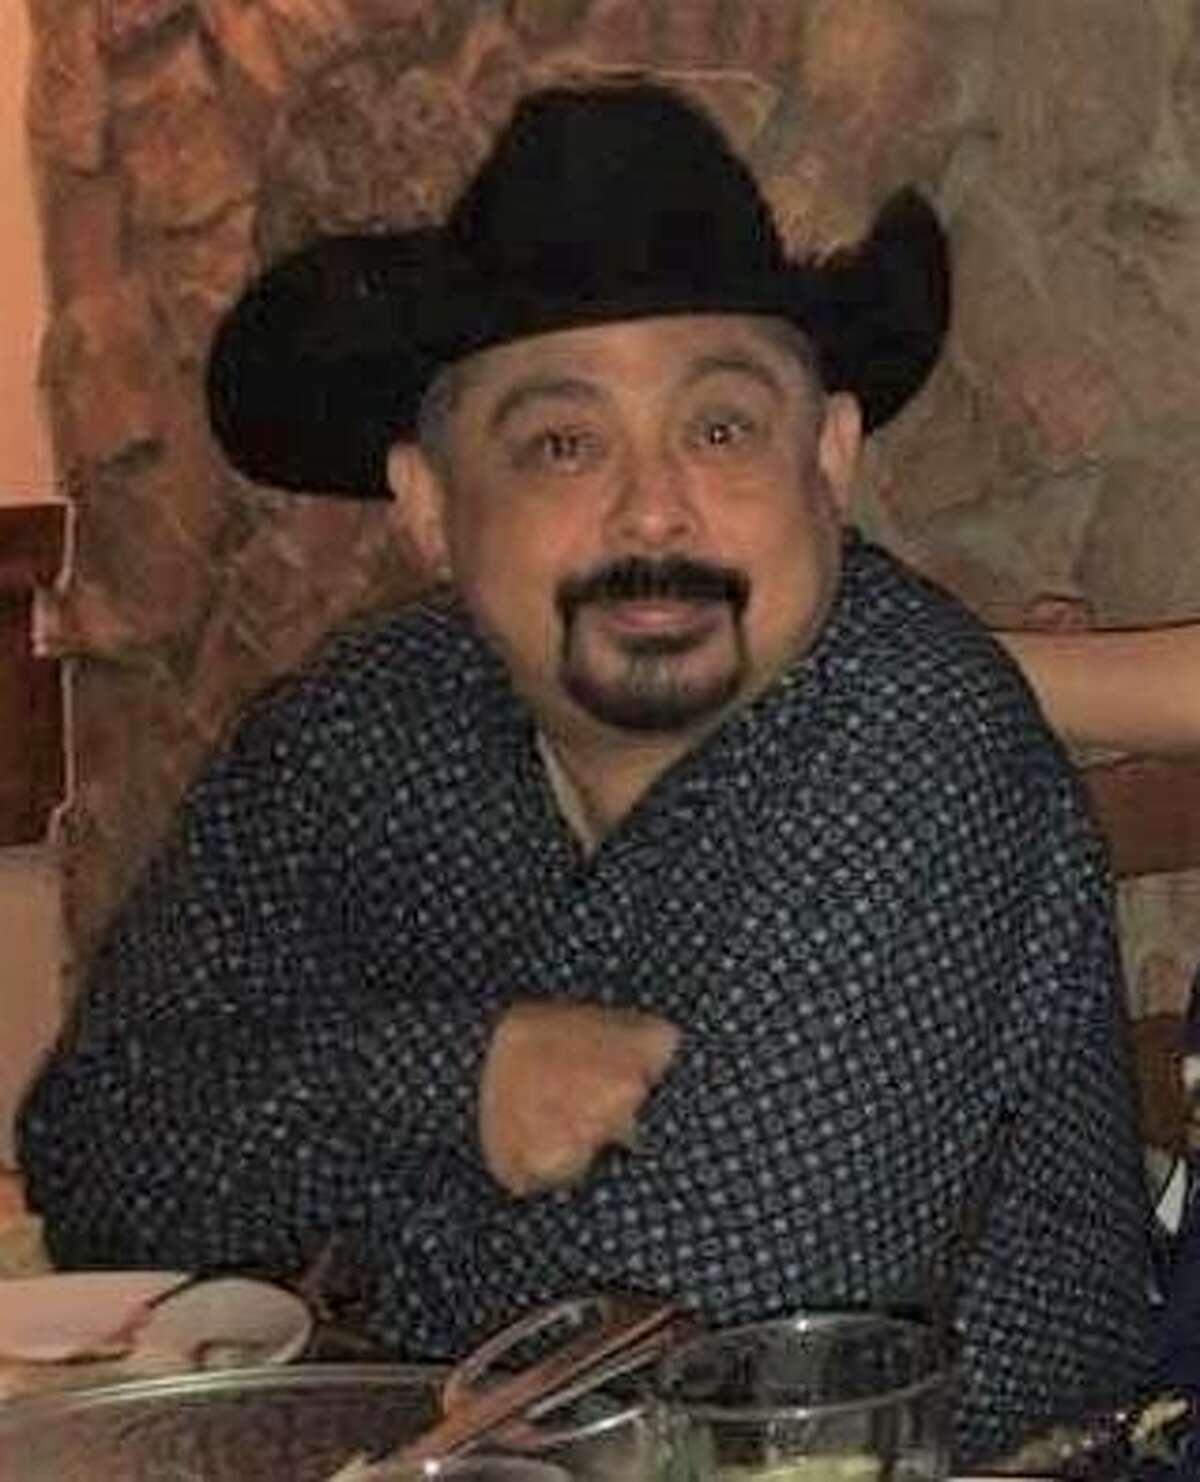 Margarito Cavazos, Jr.